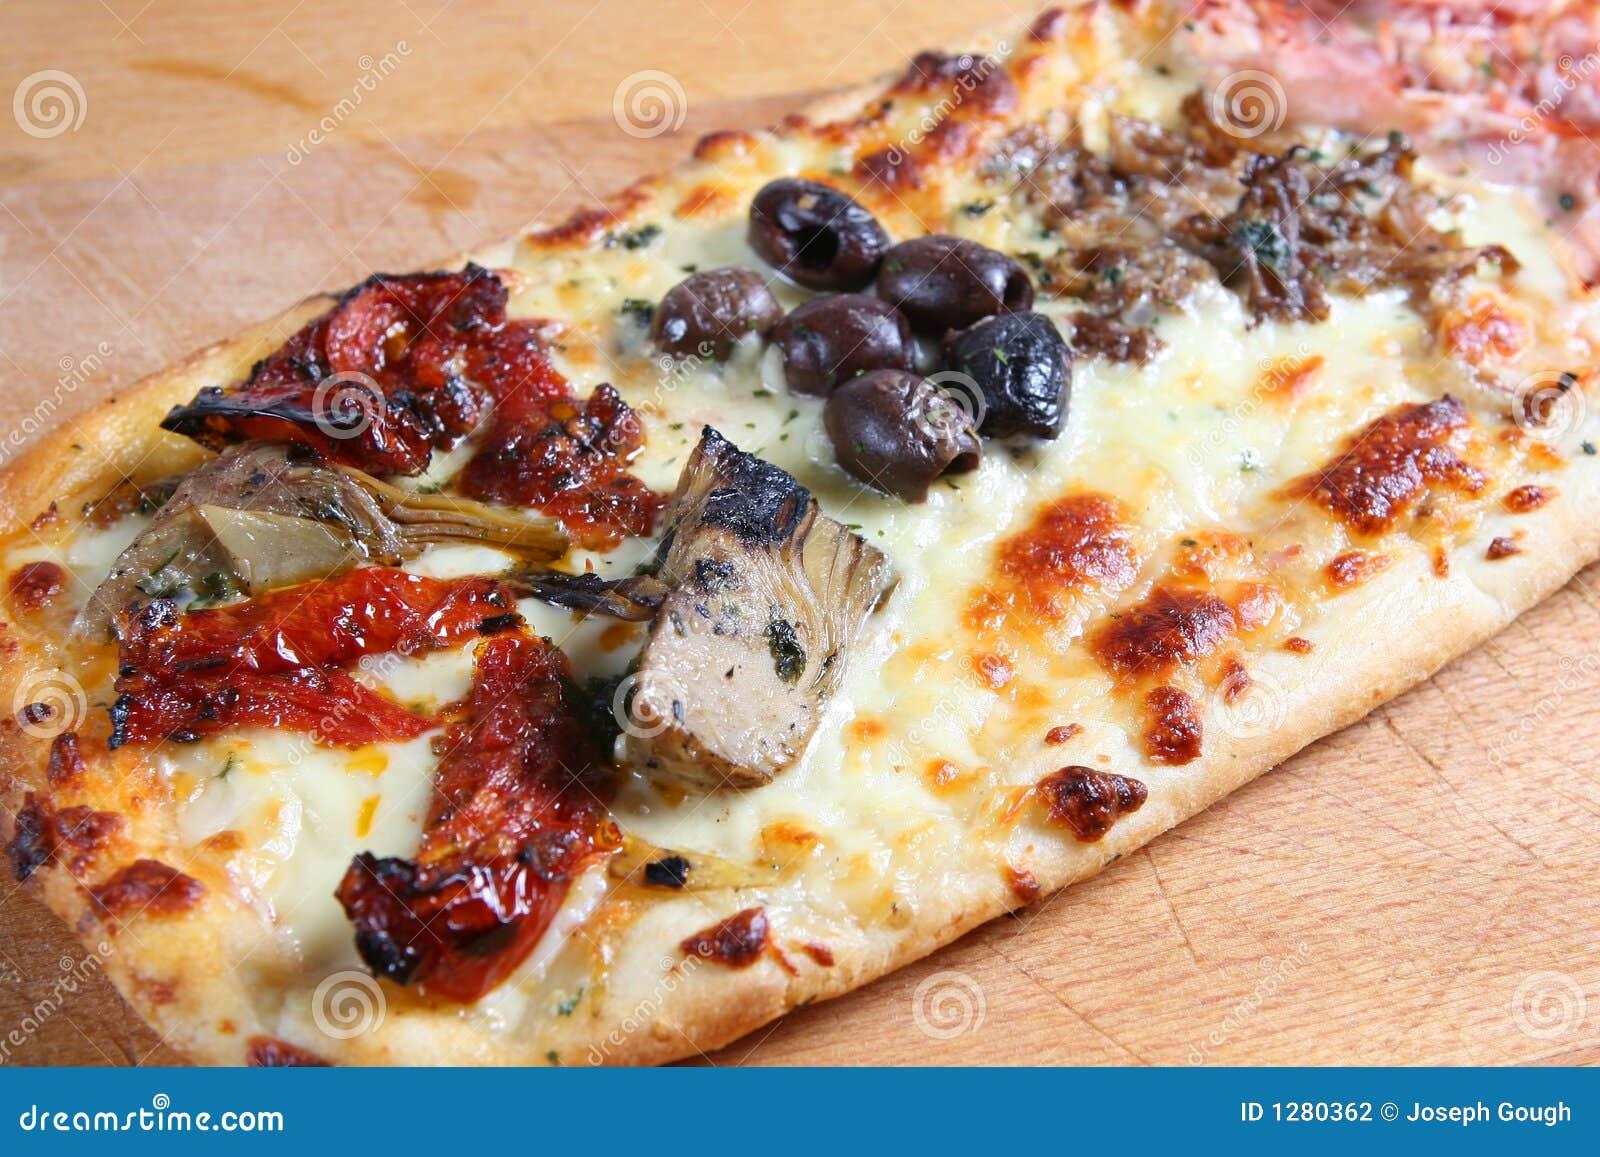 pizza quattro stagioni stock photography image 1280362. Black Bedroom Furniture Sets. Home Design Ideas